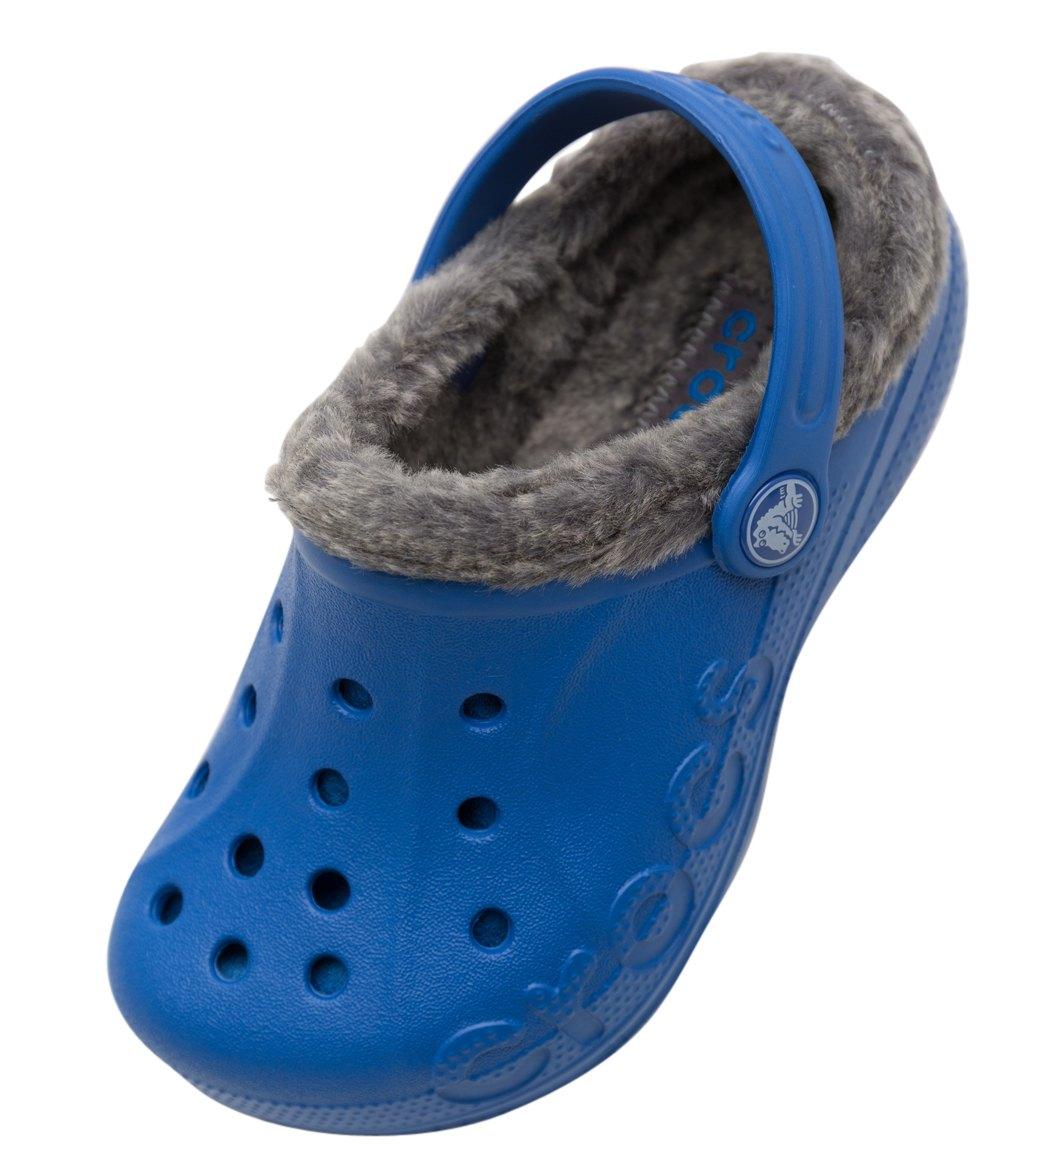 7ba6cd02cfa1 Crocs Kids  Baya Heathered Lined Clog (Toddler  Little Kid  Big Kid) at ...